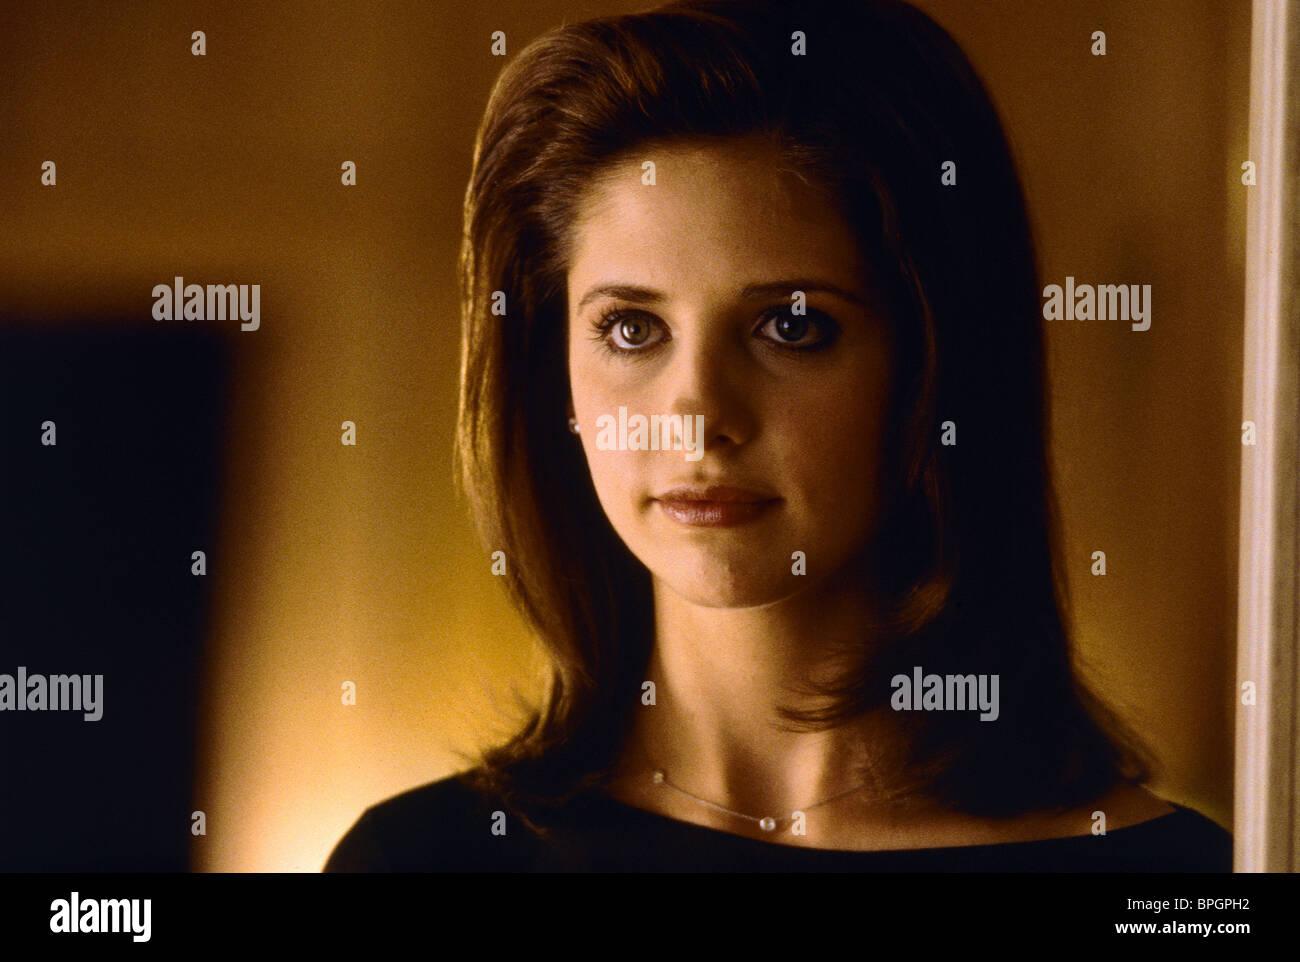 sarah michelle gellar cruel intentions - HD1200×805